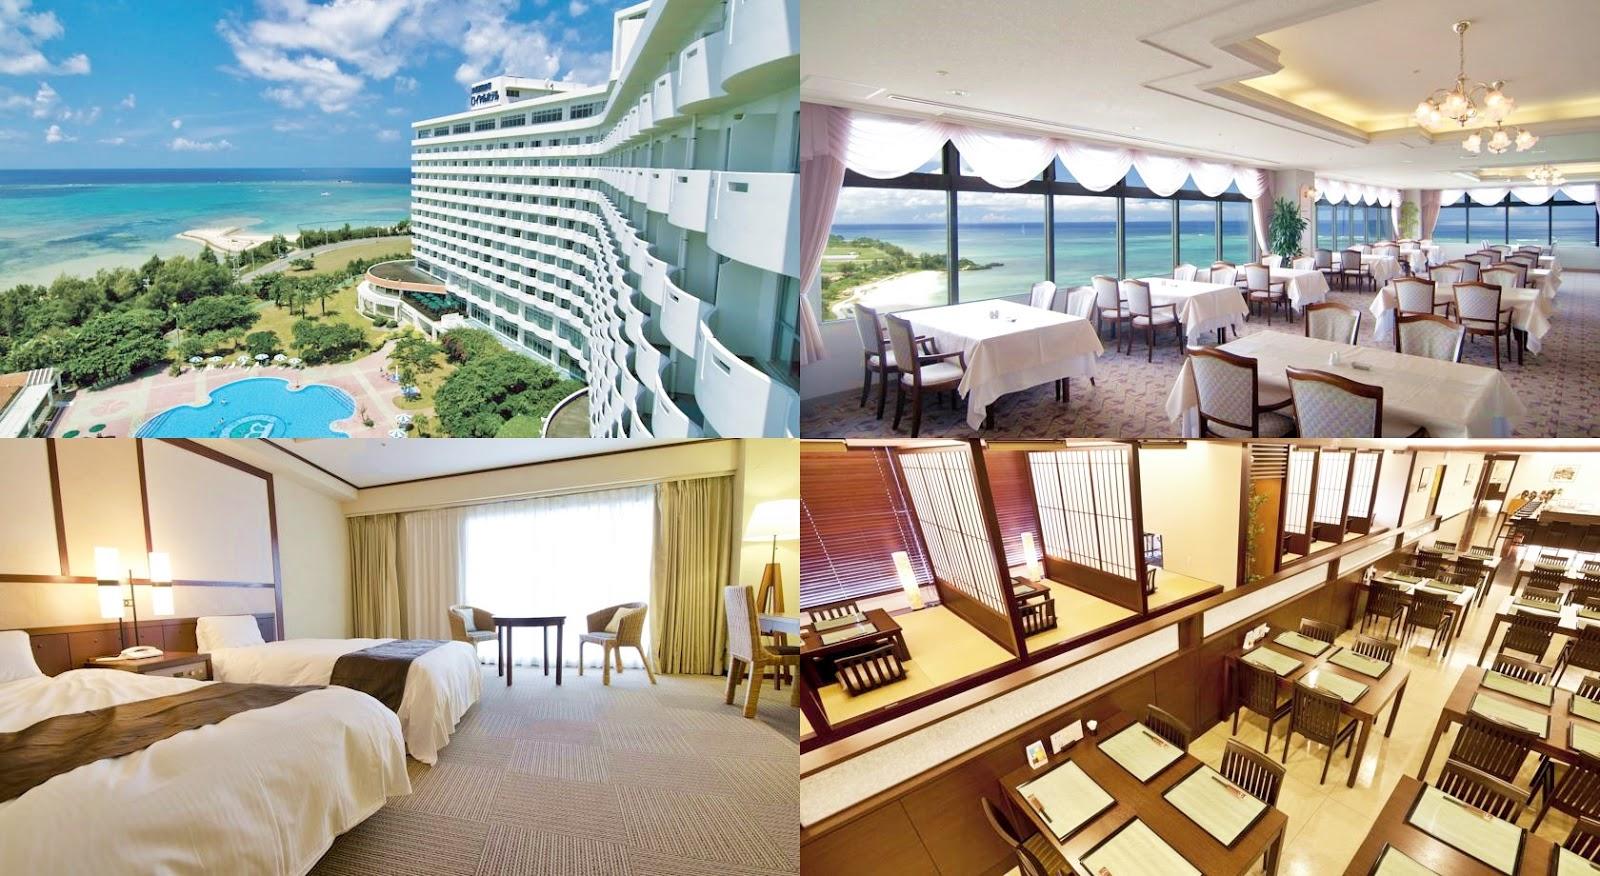 沖繩-住宿-推薦-沖繩-殘波岬-皇家酒店-Okinawa-Zanpamisaki-Royal-Hotel-Okinawa-hotel-recommendation